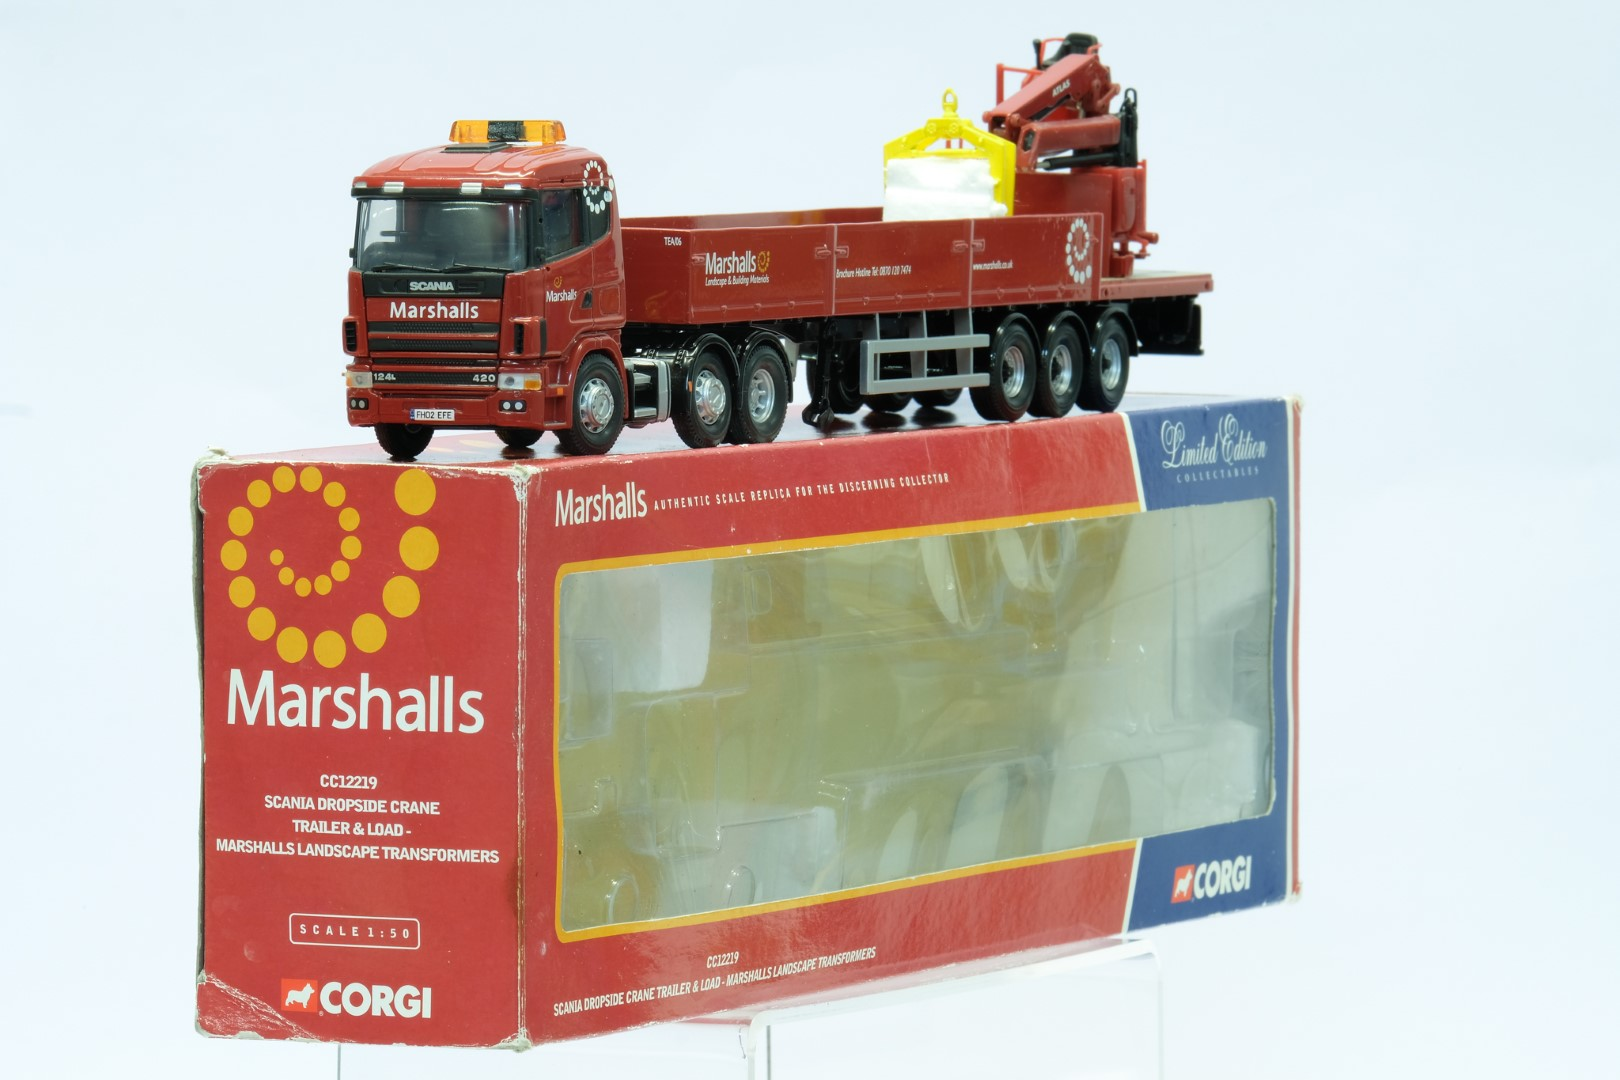 Corgi Marshalls Landscape Transformers Scania Dropside Crane Trailer & Load - Image 2 of 3